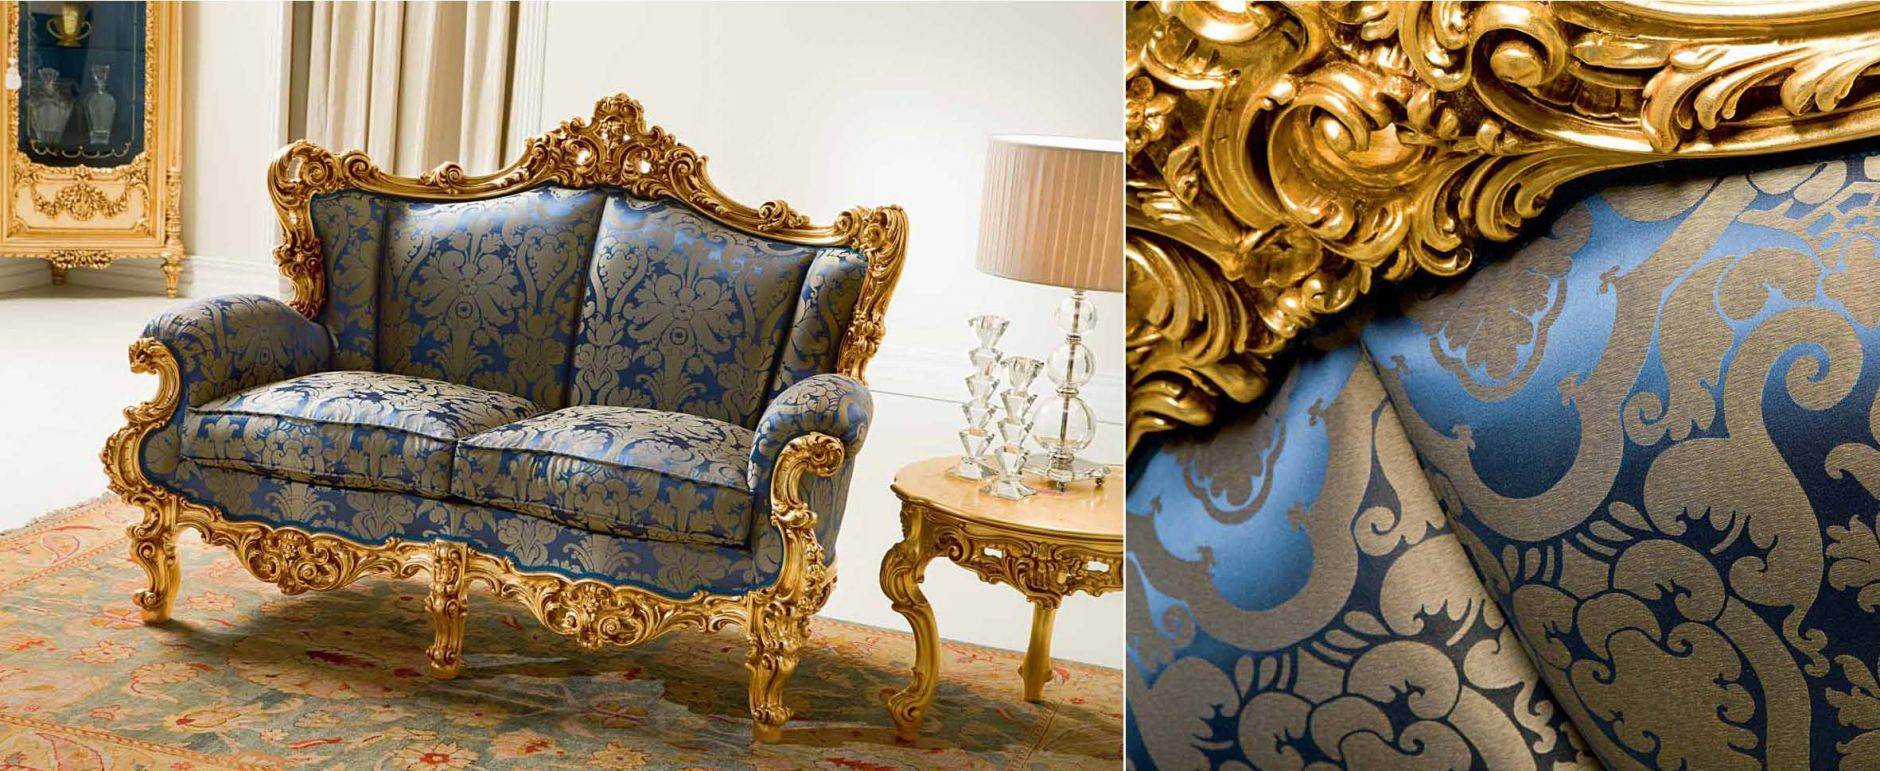 Luxurious Furniture Luxury Furniture Silik Eolo